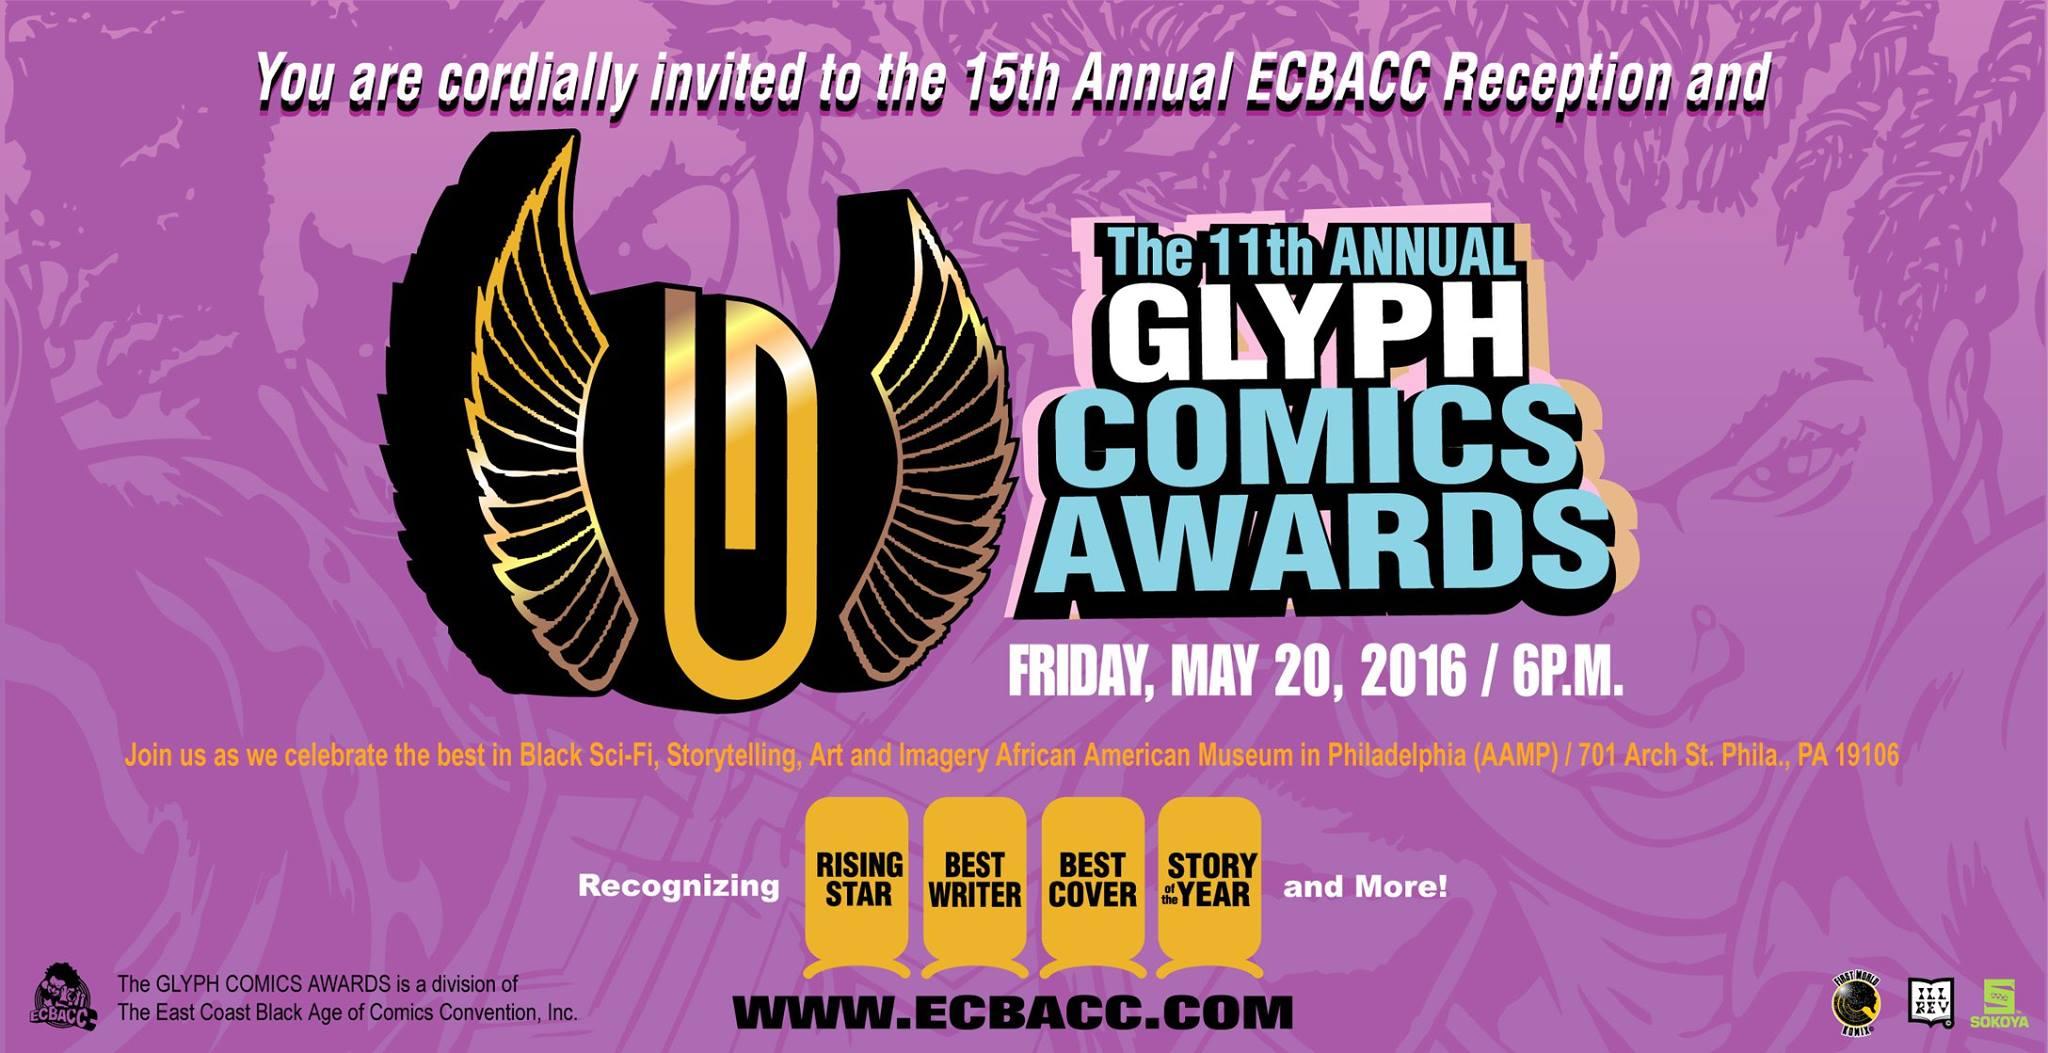 the glyph awards, ecbacc, theblerdgurl,